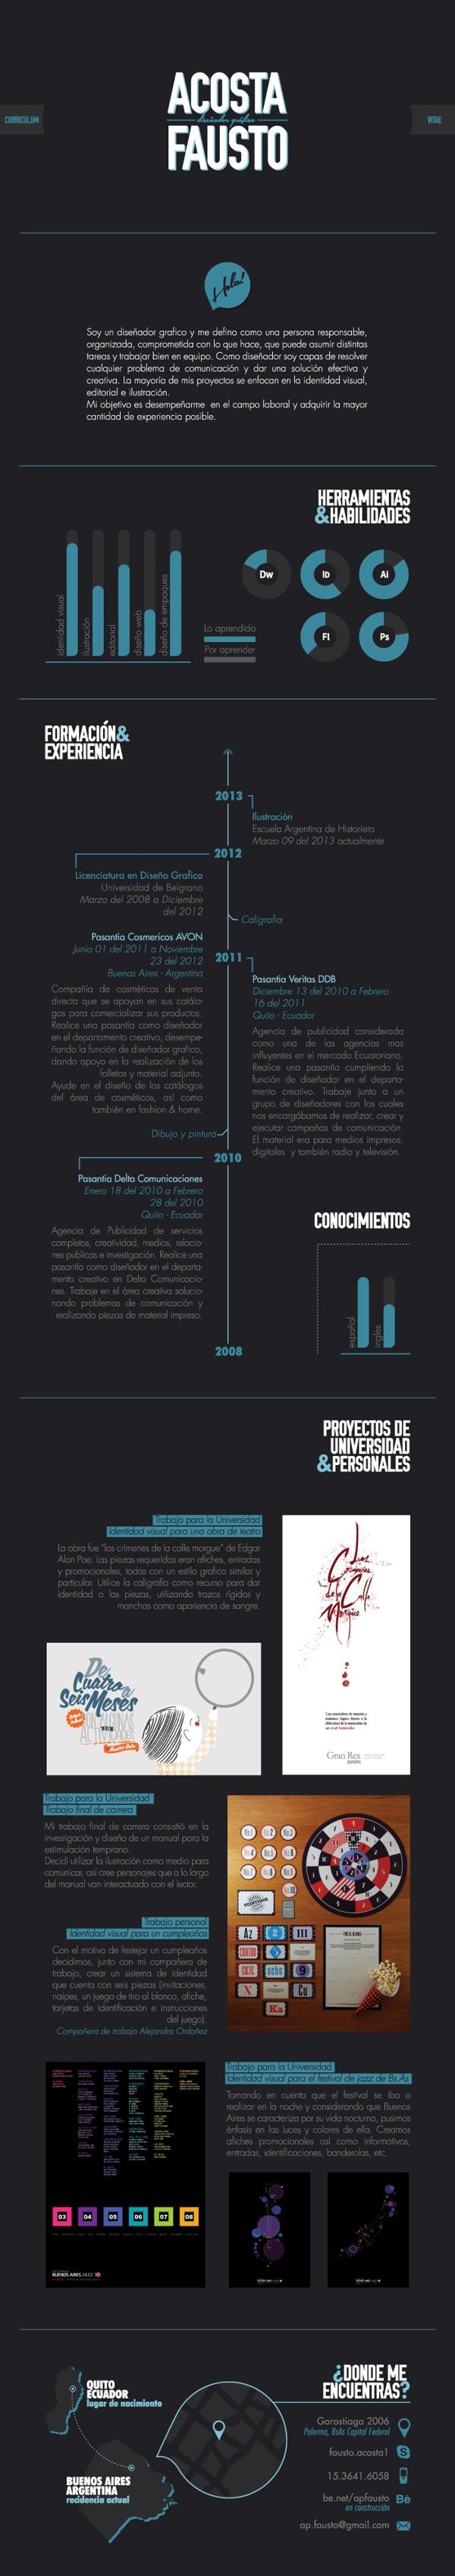 136 best Curriculum vitae images on Pinterest | Resume design, Page ...